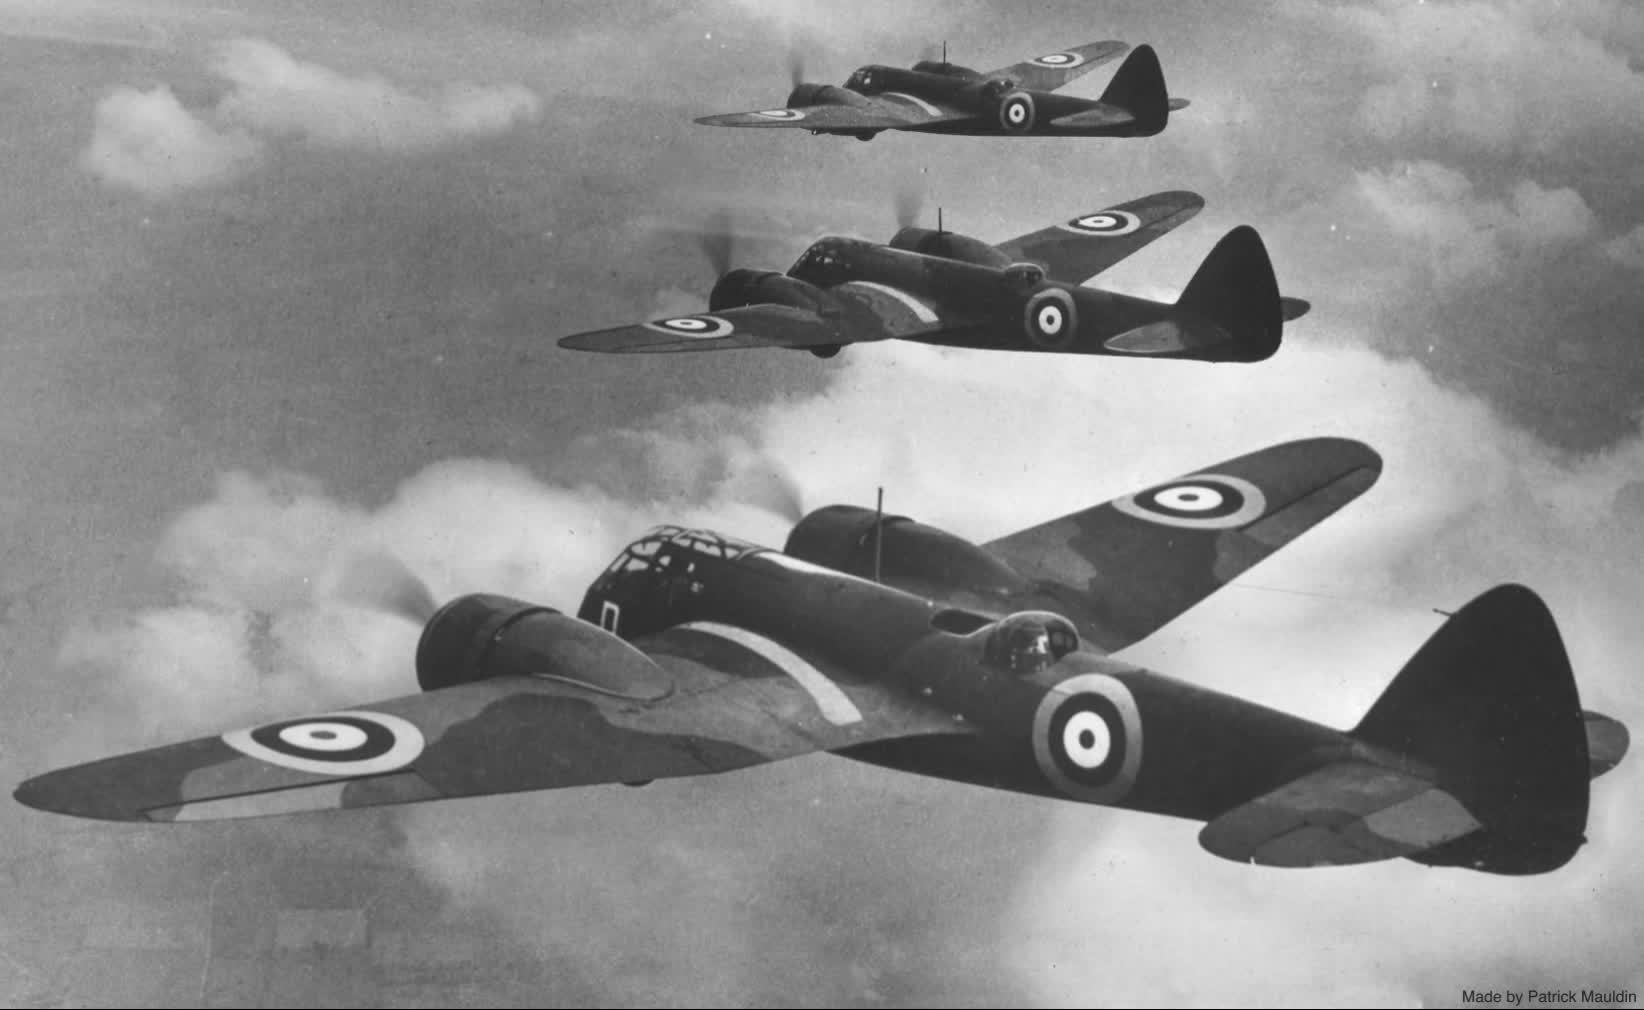 Parallax, RAF, wwiiplanes, Parallax WWII RAF MK1 Bombers GIFs